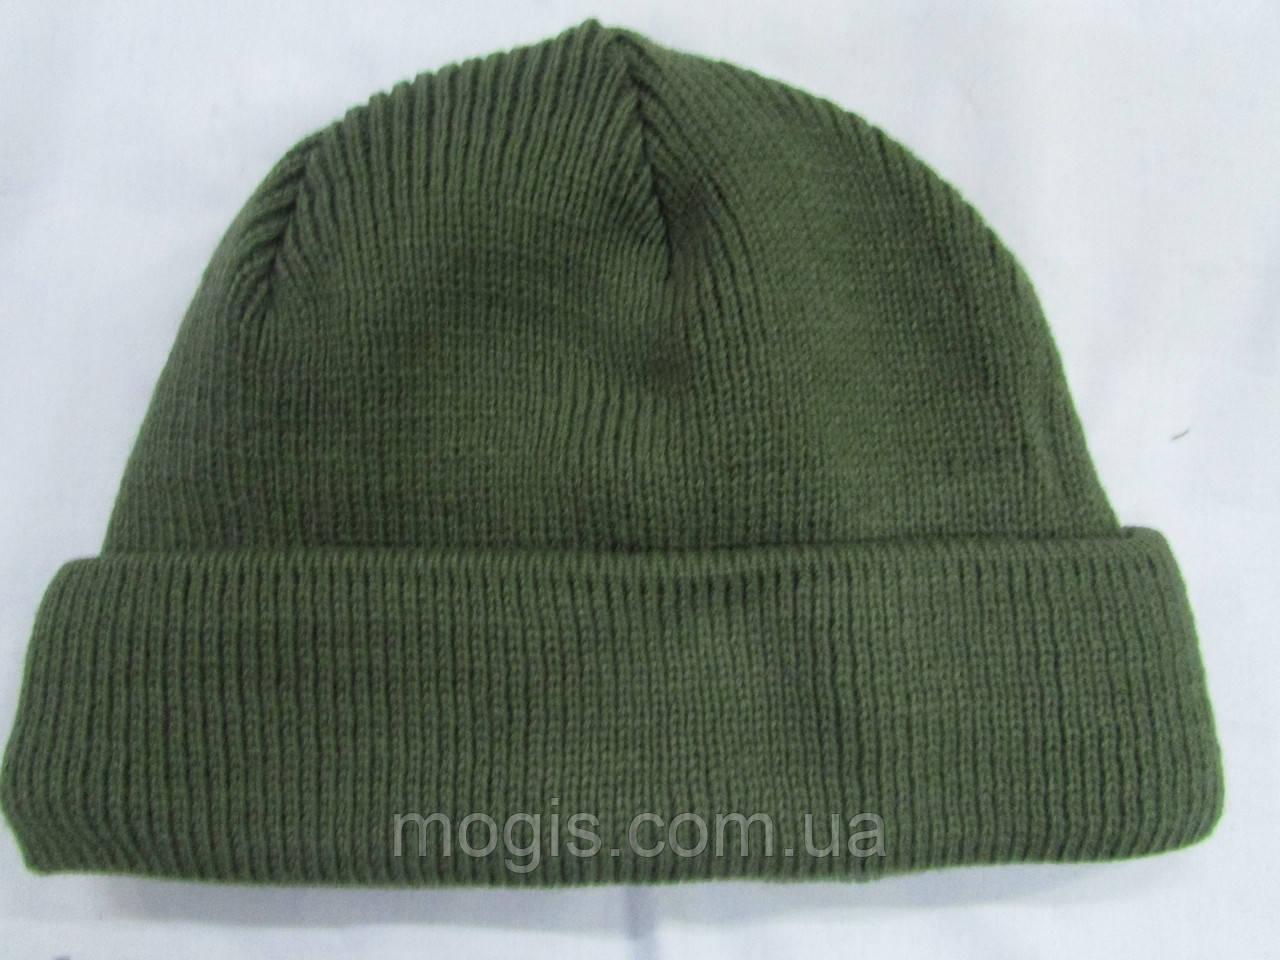 Вязаная шапка грубой вязки олива